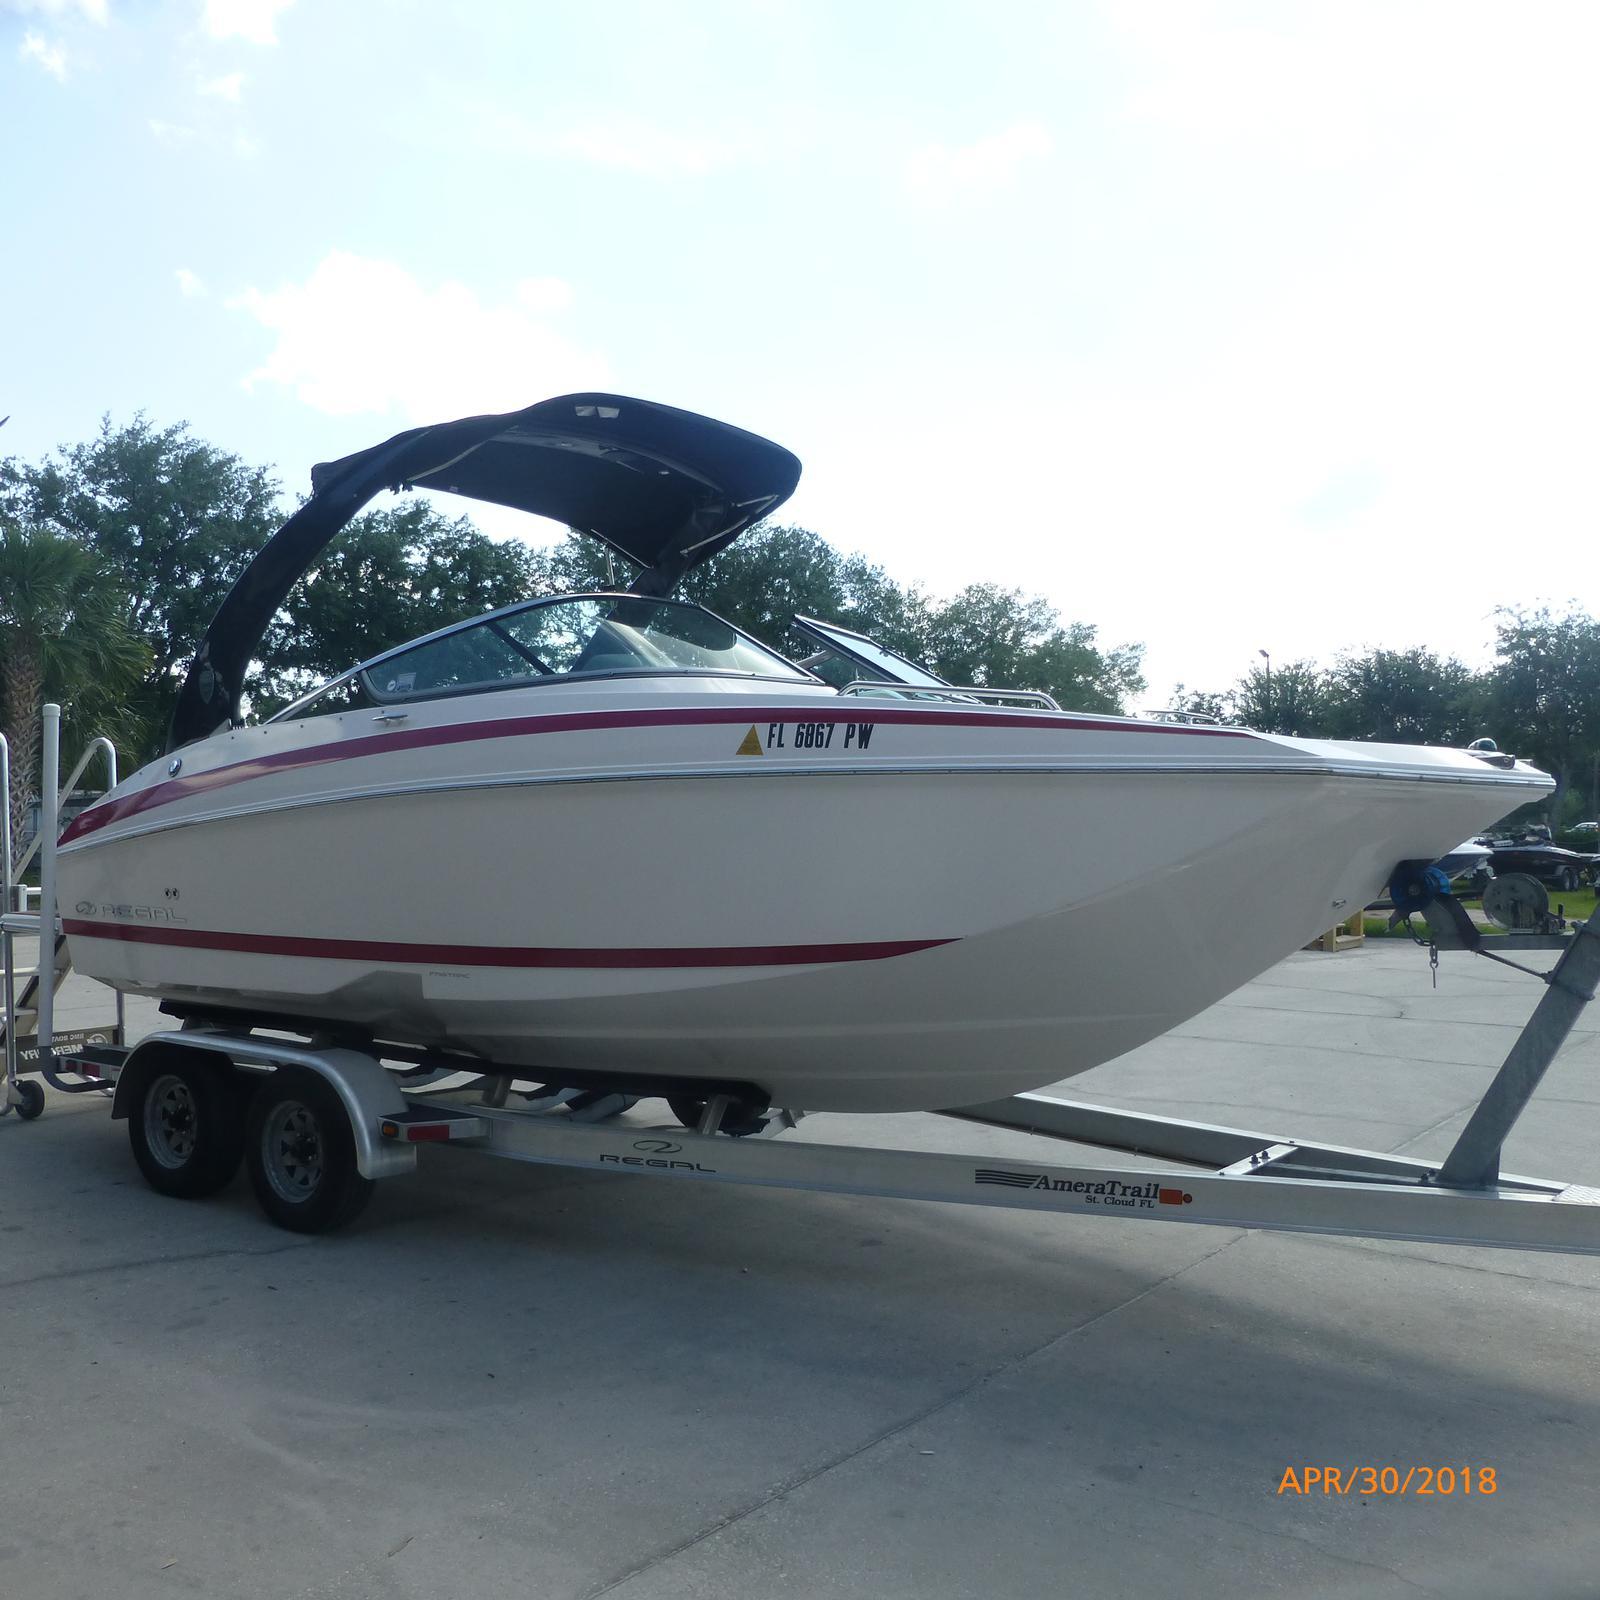 Regal Deck Boat 24 FasDeck RX